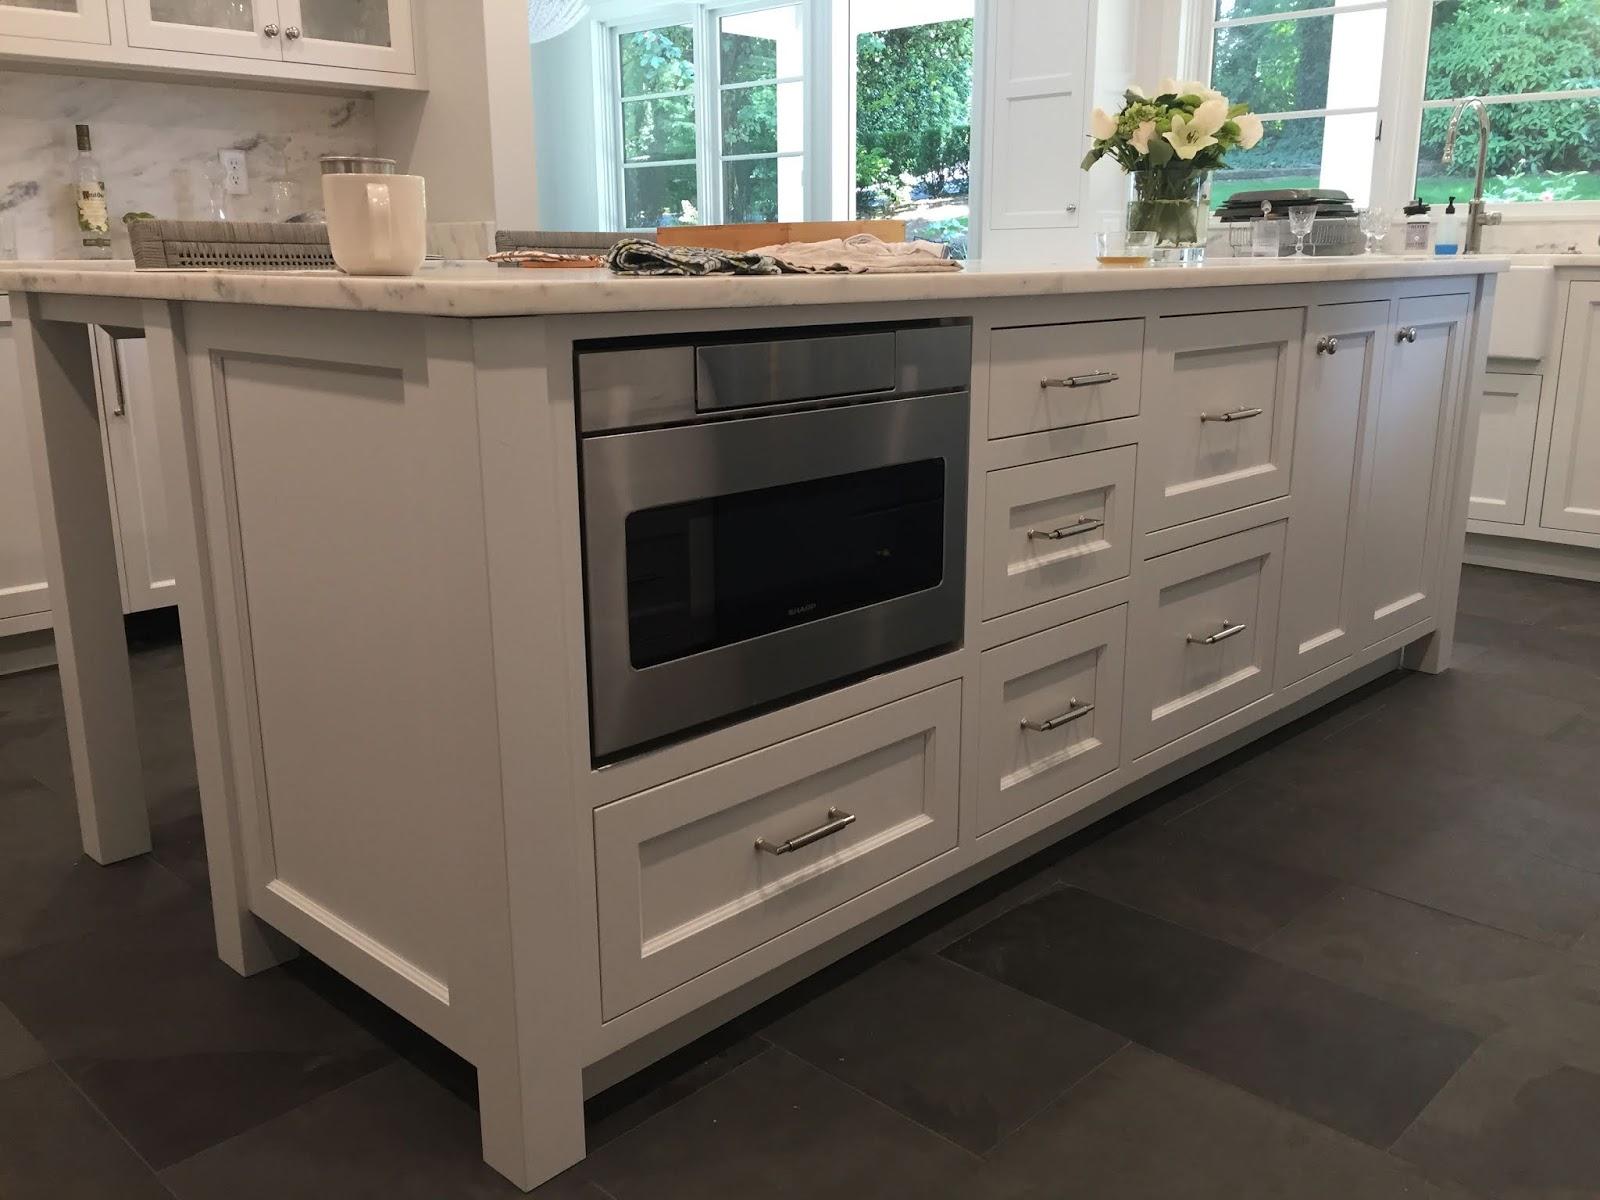 kitchen islands create built in social